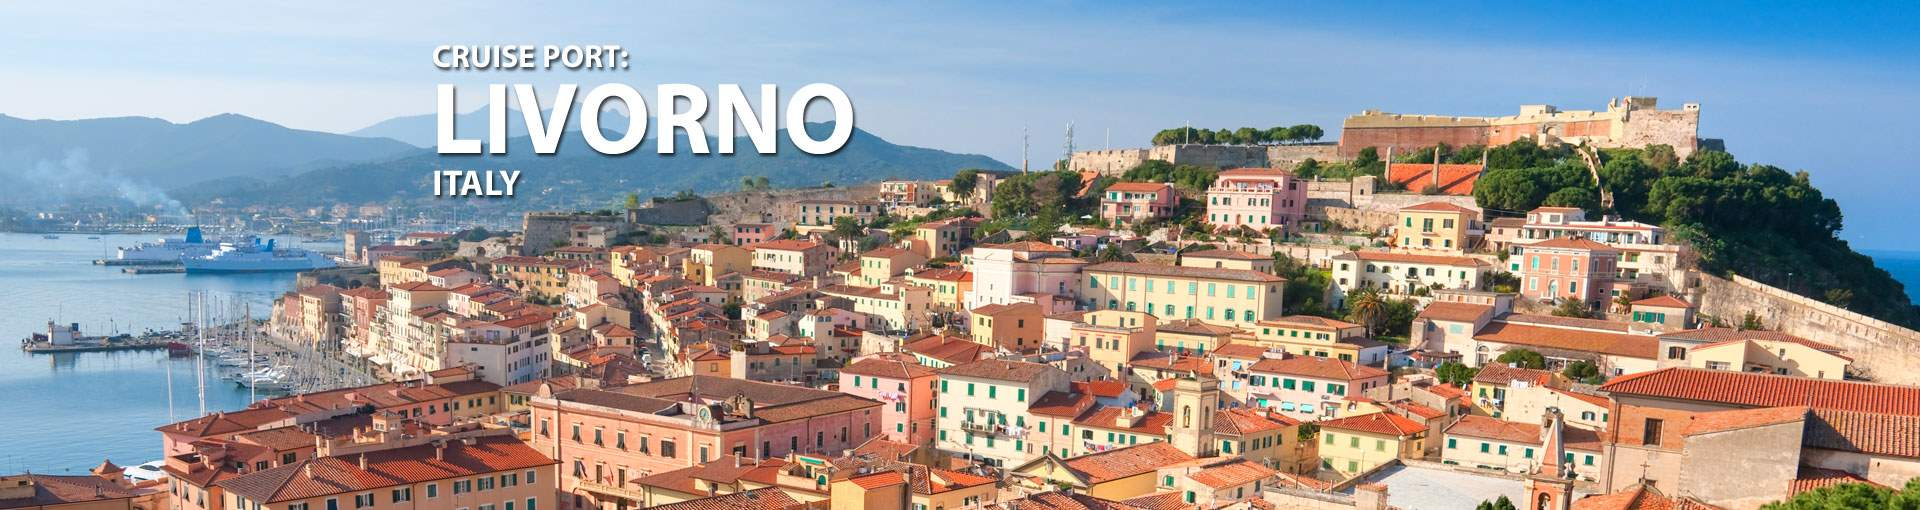 Livorno FlorencePisa Italy Cruise Port And Cruises - Italy cruises